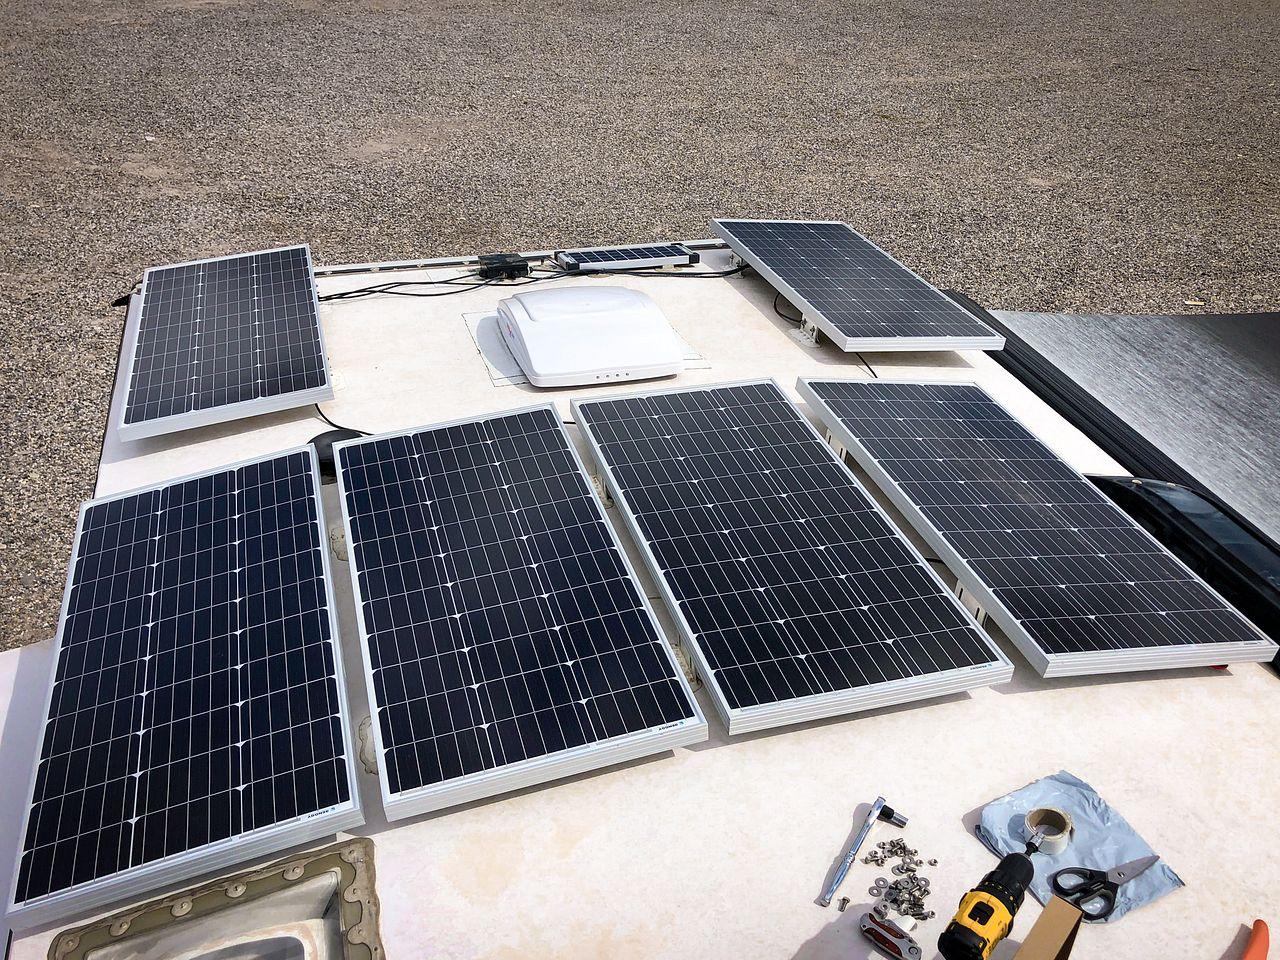 RV Solar: Part 4 - Adding More Capacity